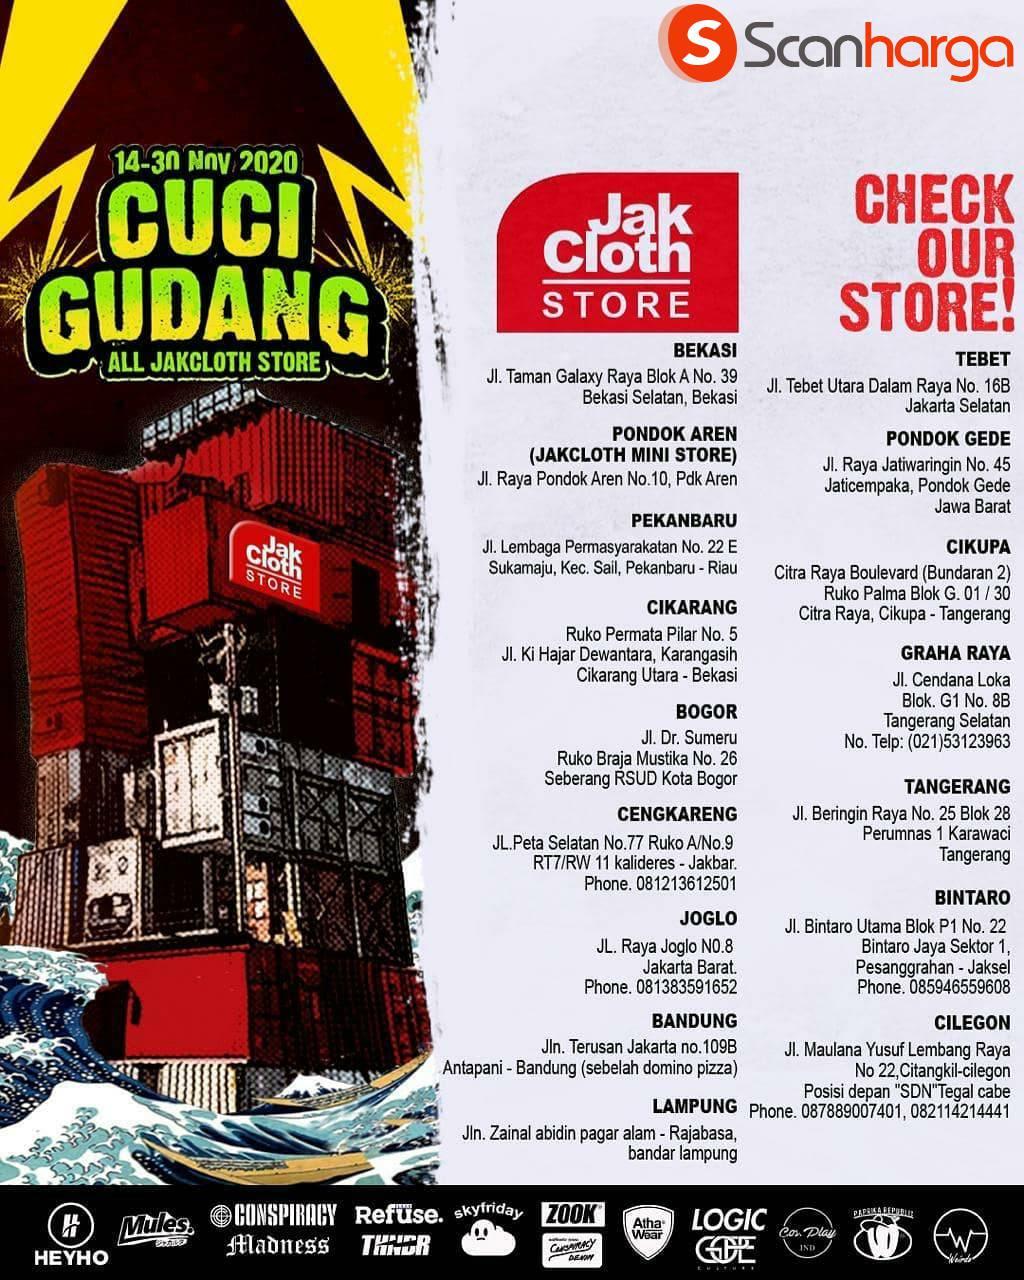 Promo Jakcloth: Cuci Gudang Diskon hingga 80% All Store* November 2020